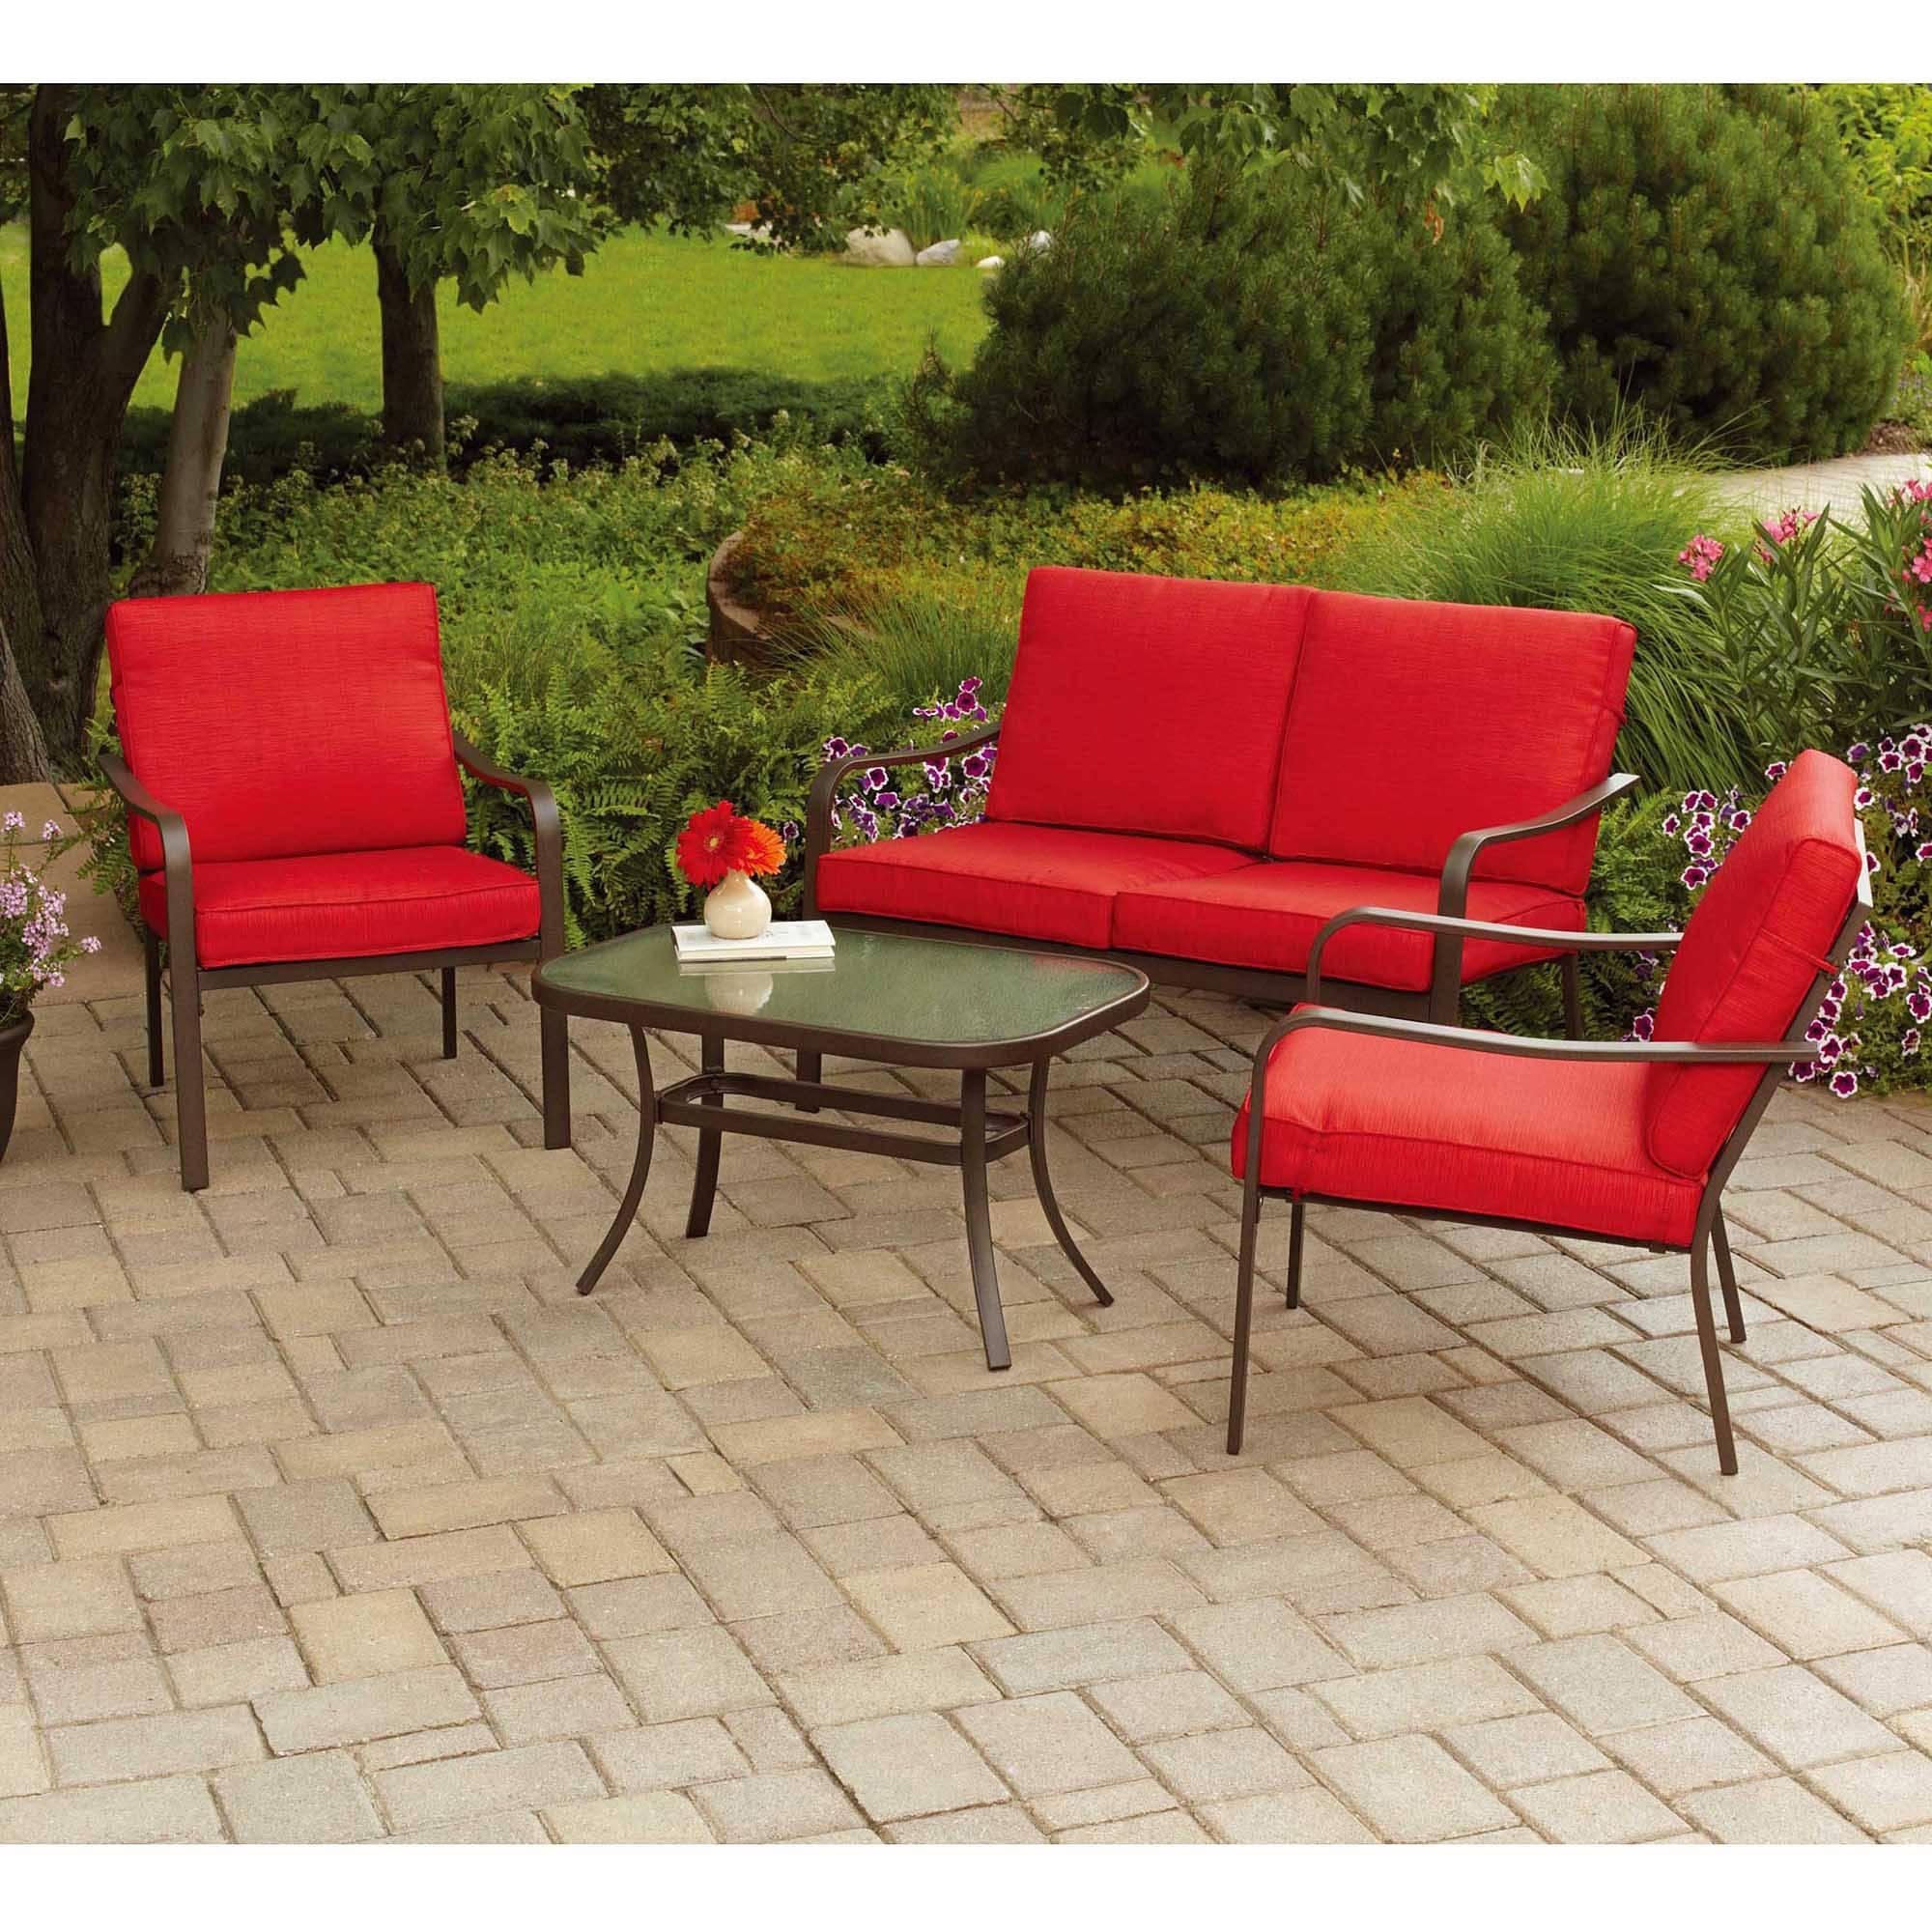 Favorite Walmart Patio Furniture Conversation Sets Throughout Mainstays Stanton Cushioned 4 Piece Patio Conversation Set, Red (View 9 of 15)